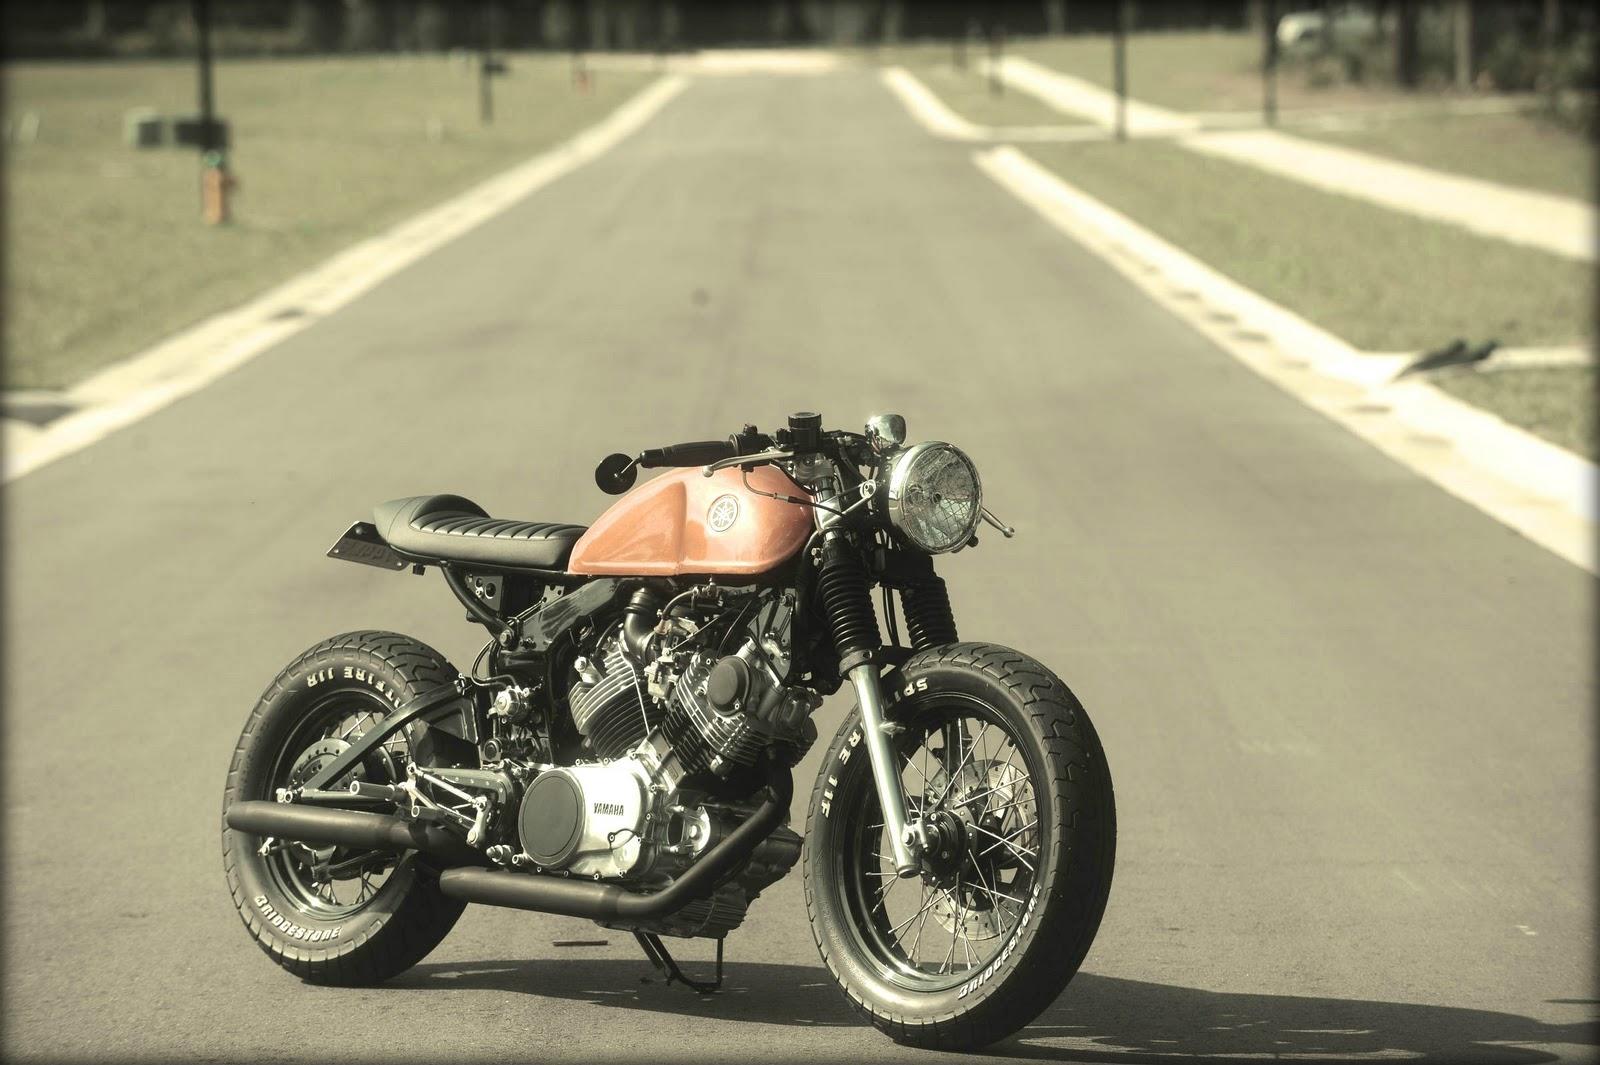 http://2.bp.blogspot.com/-WKf-guGck8A/T_lWEiIKHNI/AAAAAAAACnk/hsNSkkRxSDw/s1600/yamaha-virago-XV750-cafe-racer-wallpaper-1.jpg